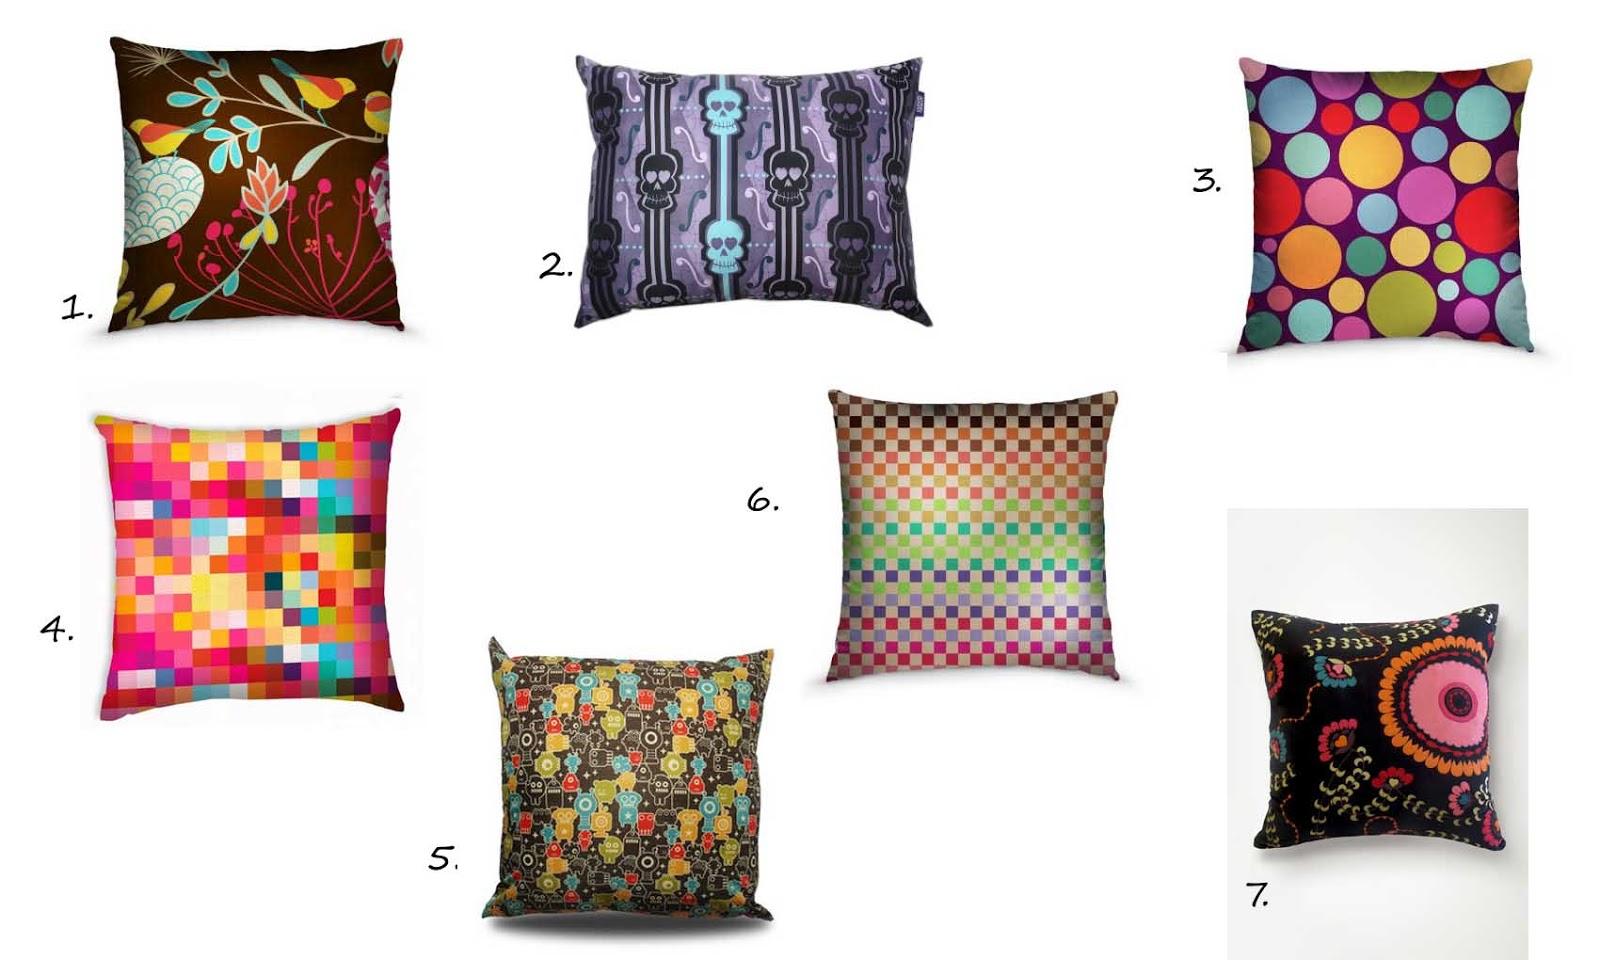 Vitrine do Varejo: Onde comprar almofadas online #AE1D5A 1600x960